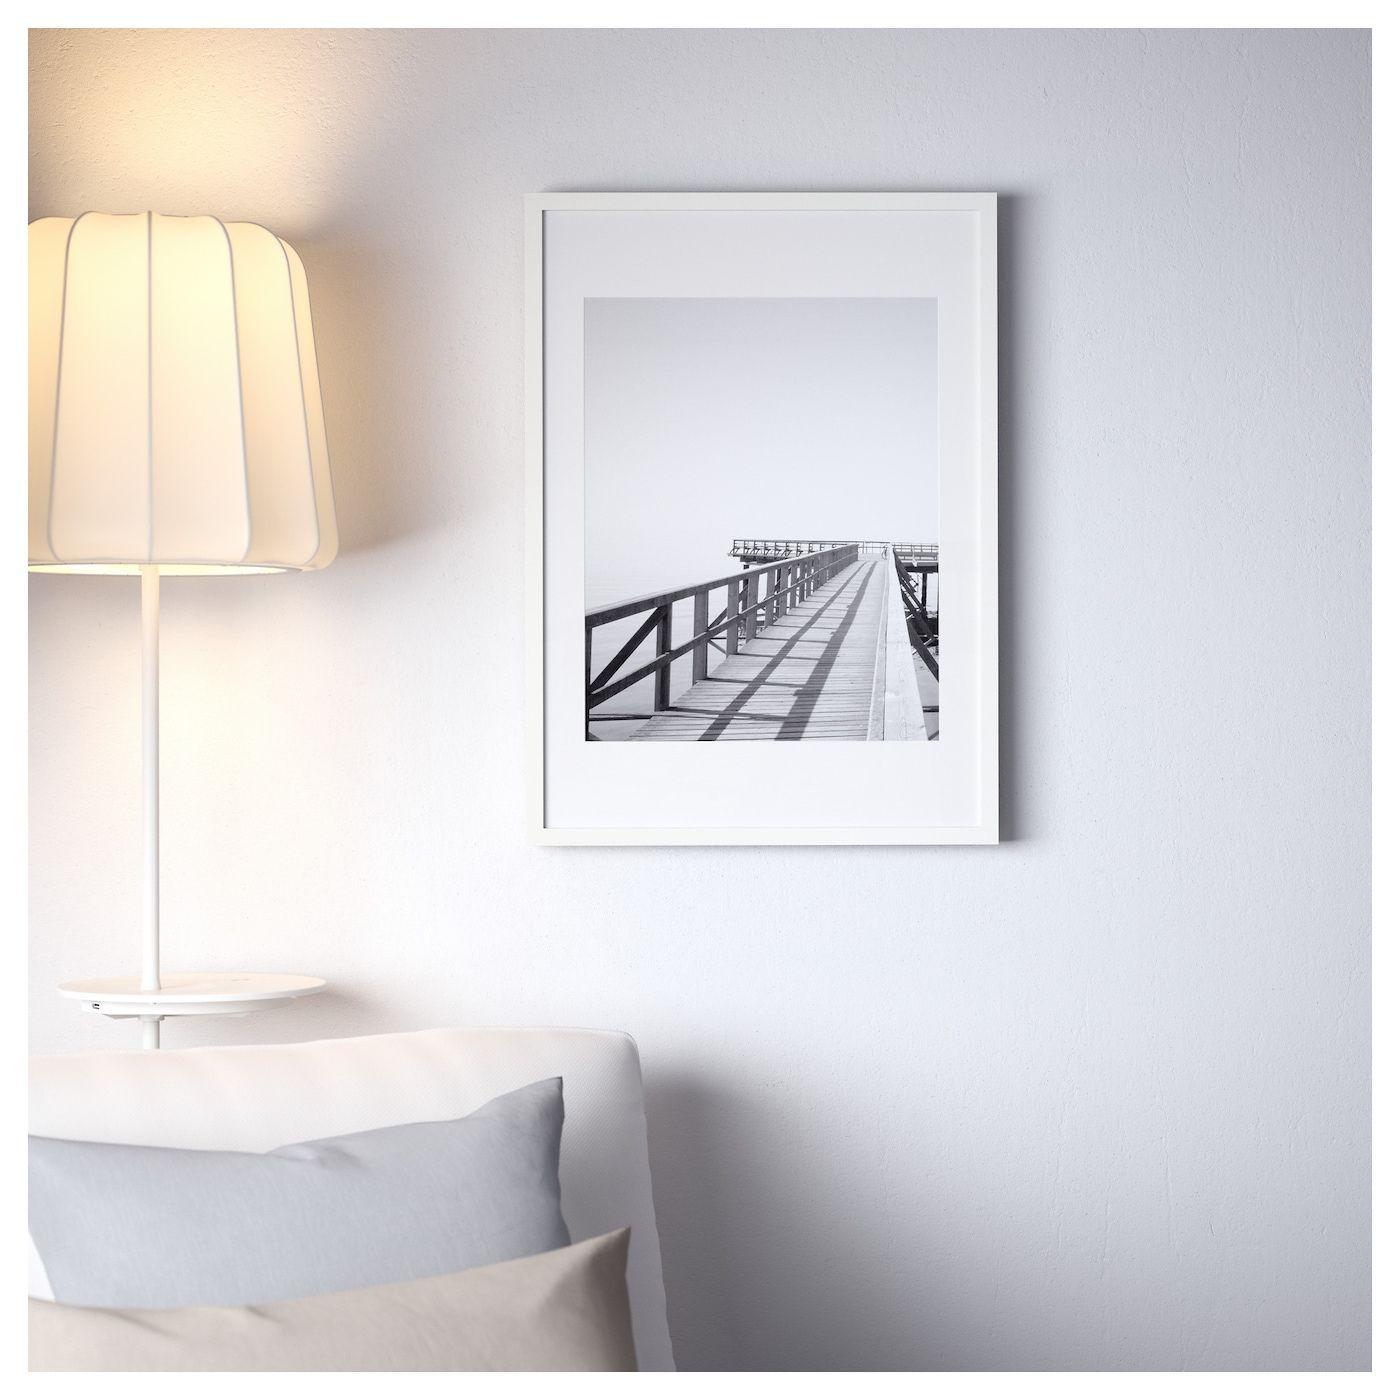 IKEA RIBBA White Frame Ikea, Ikea frames, Ribba frame